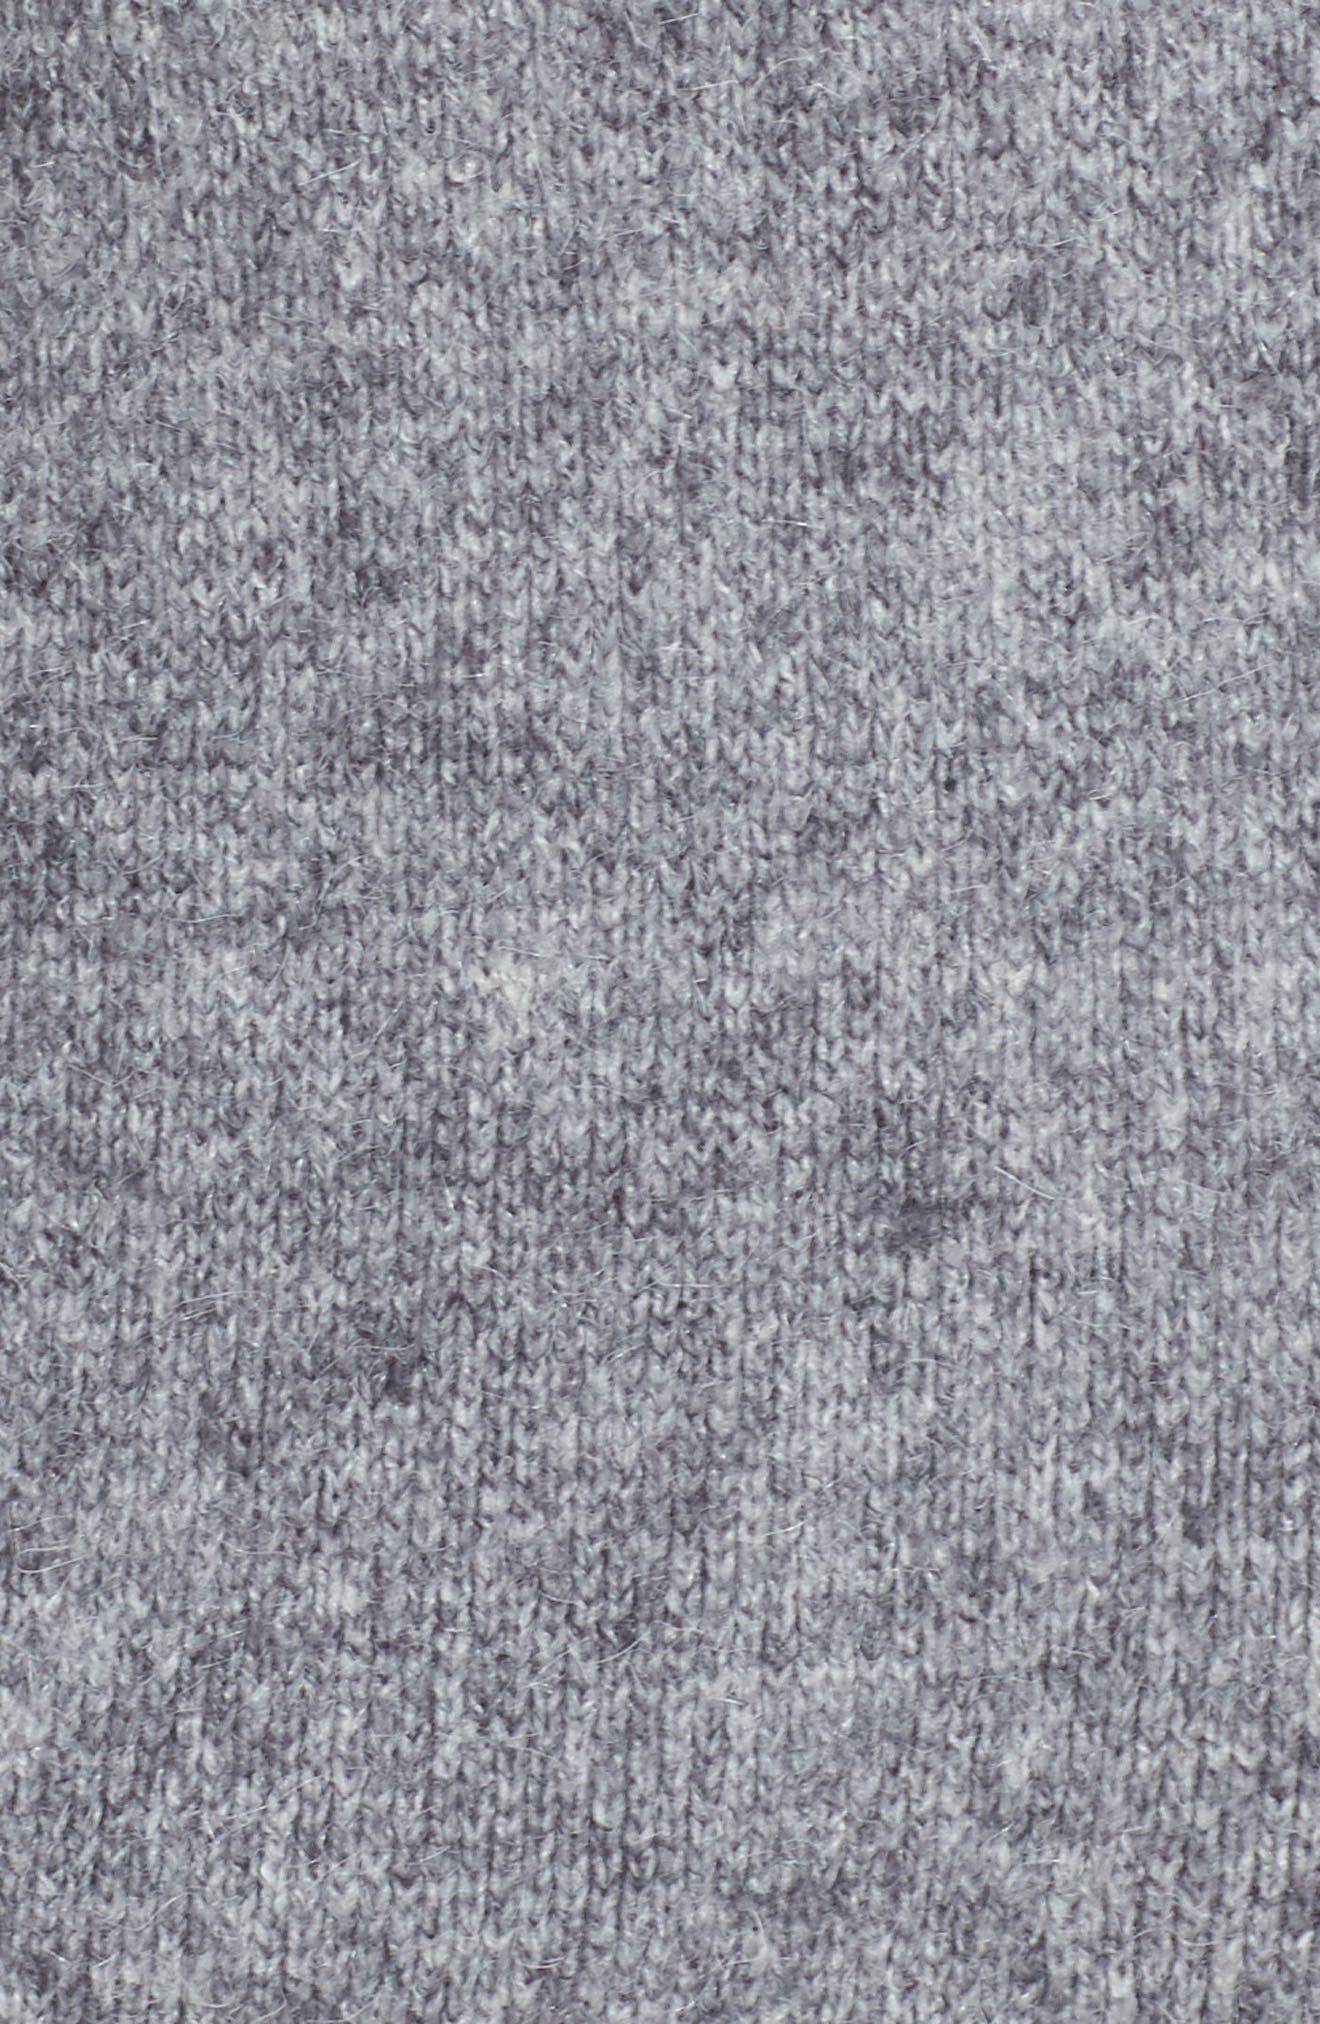 Zanja Embroidered Knit Bomber Jacket,                             Alternate thumbnail 5, color,                             Medium Grey Melange